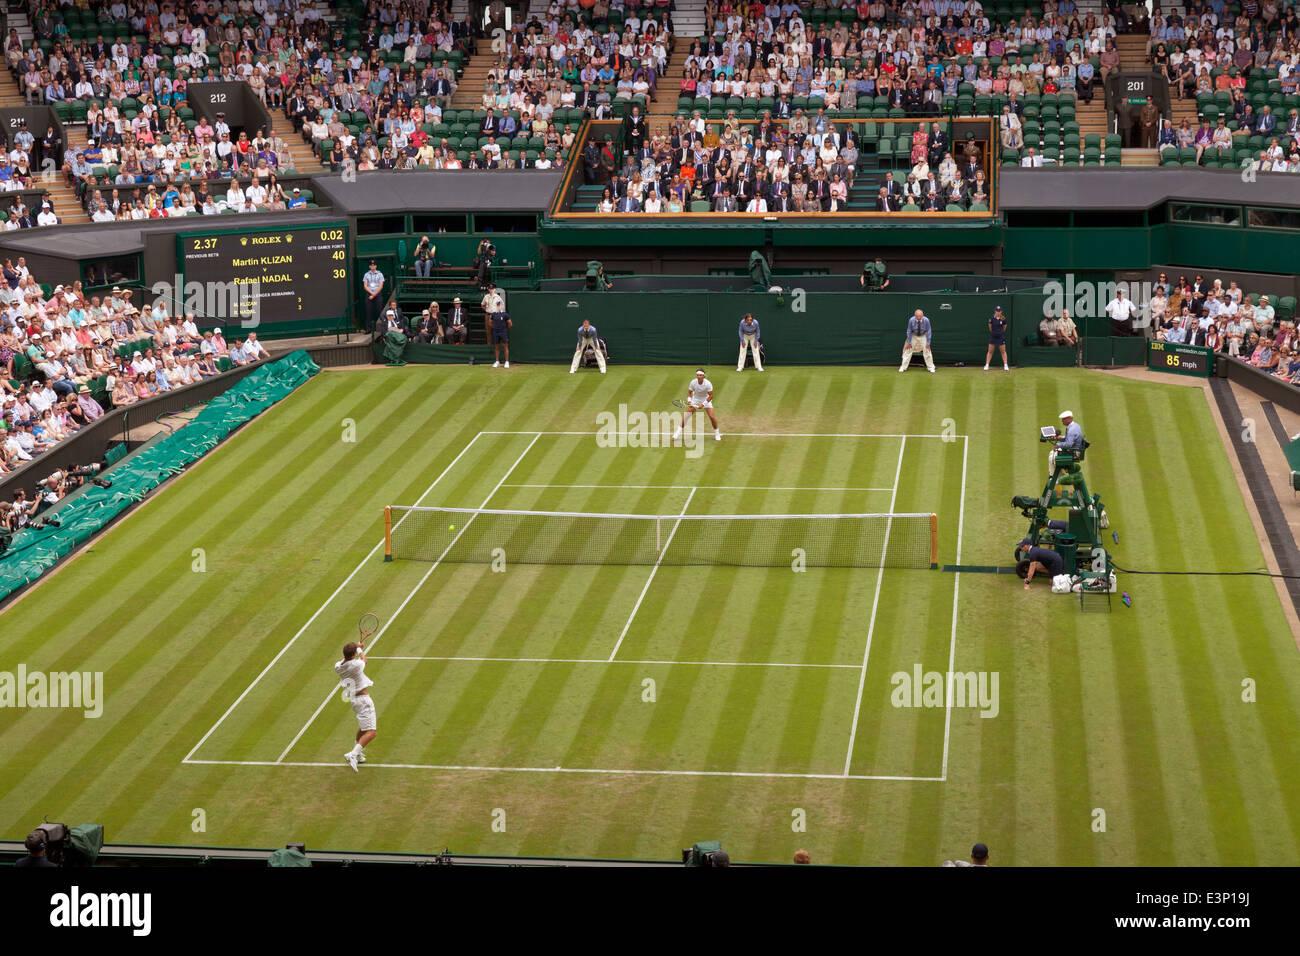 Centre Court Tennis Game